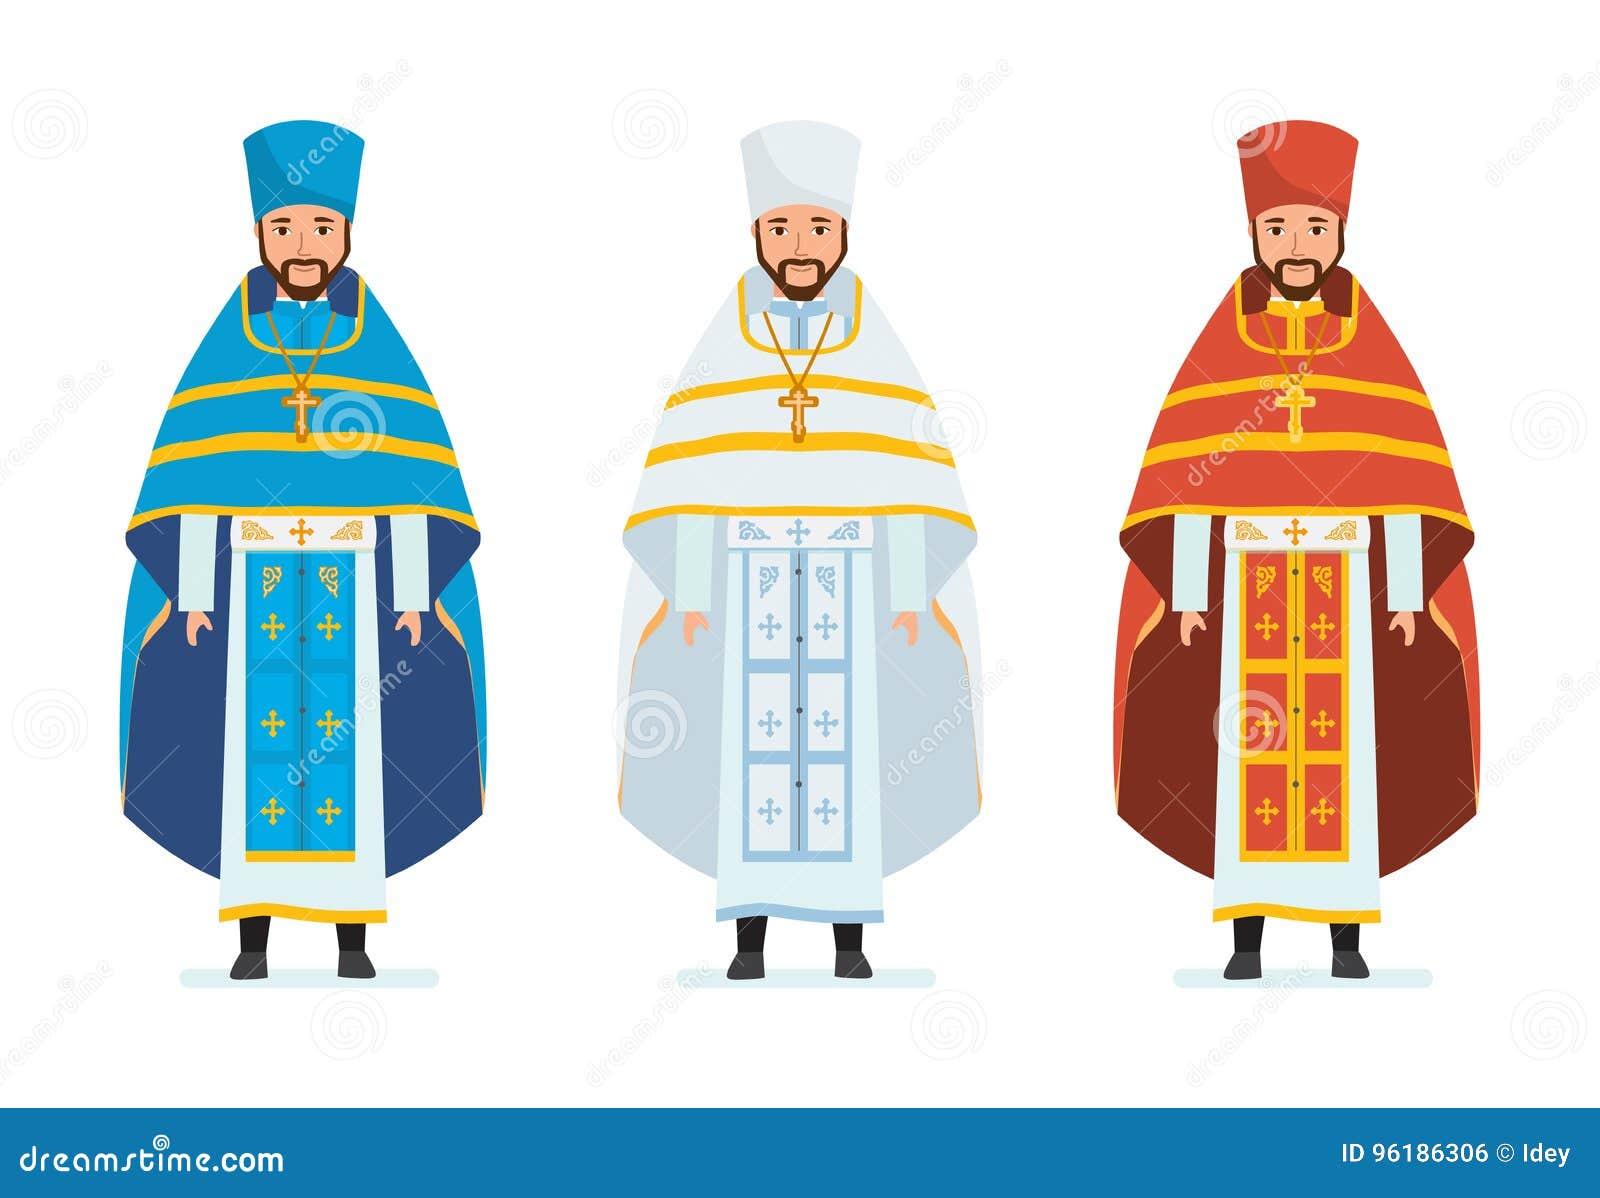 Sacerdoti Religiosi, In Bei Abiti Spirituali, Abiti Talari